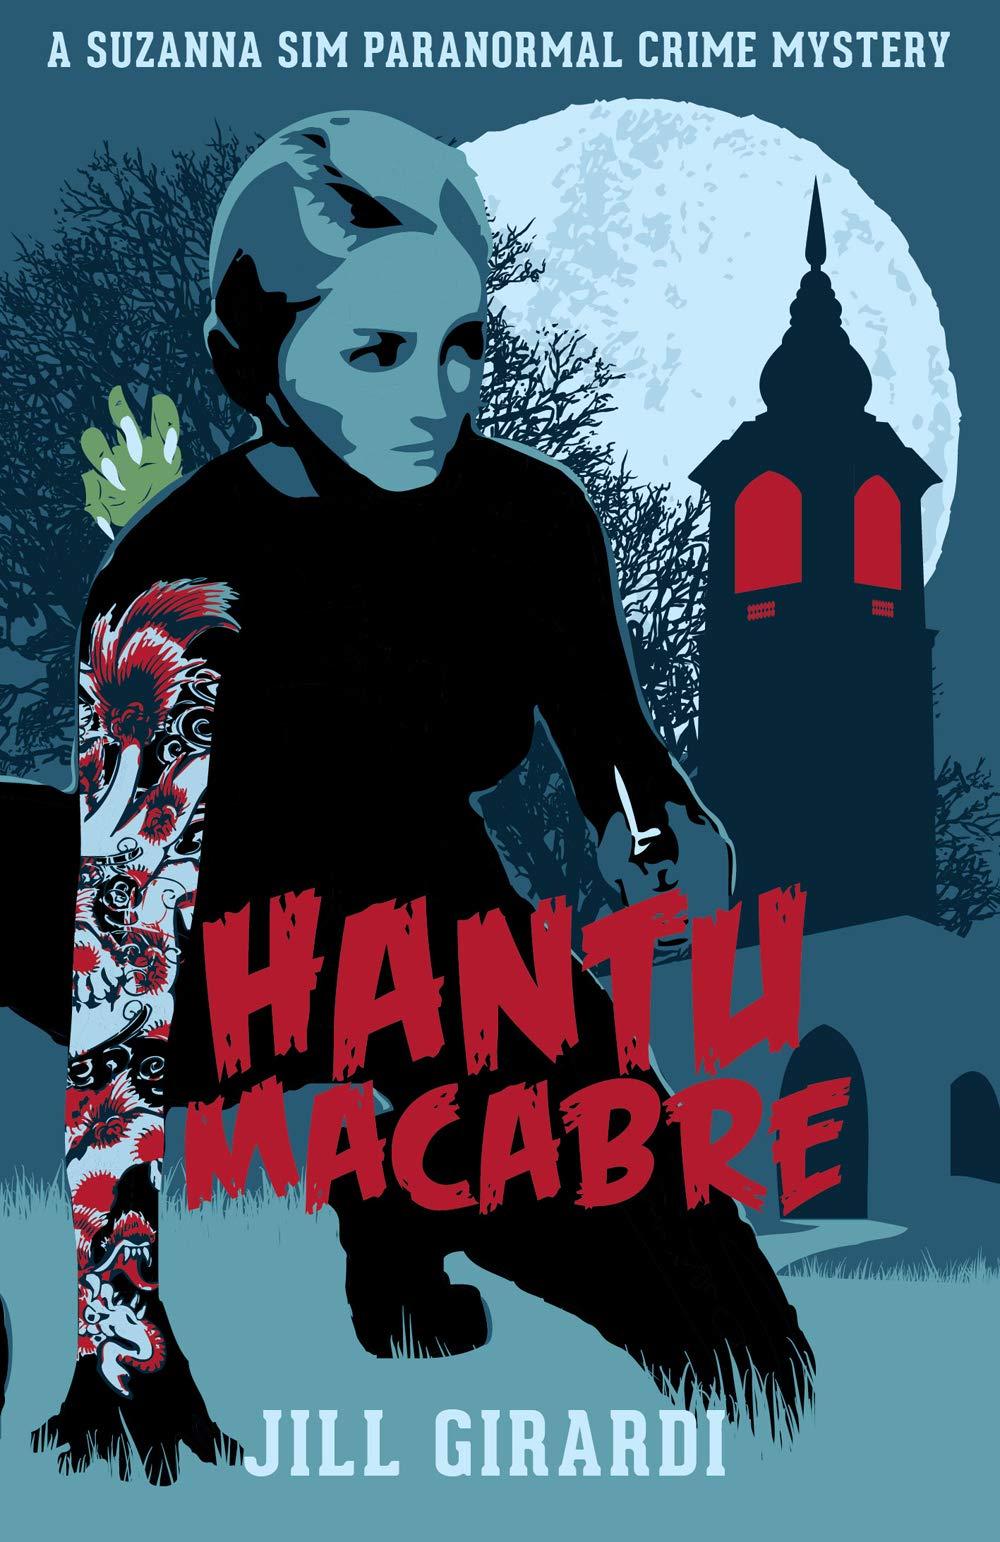 Hantu Macabre by Jill Girardi